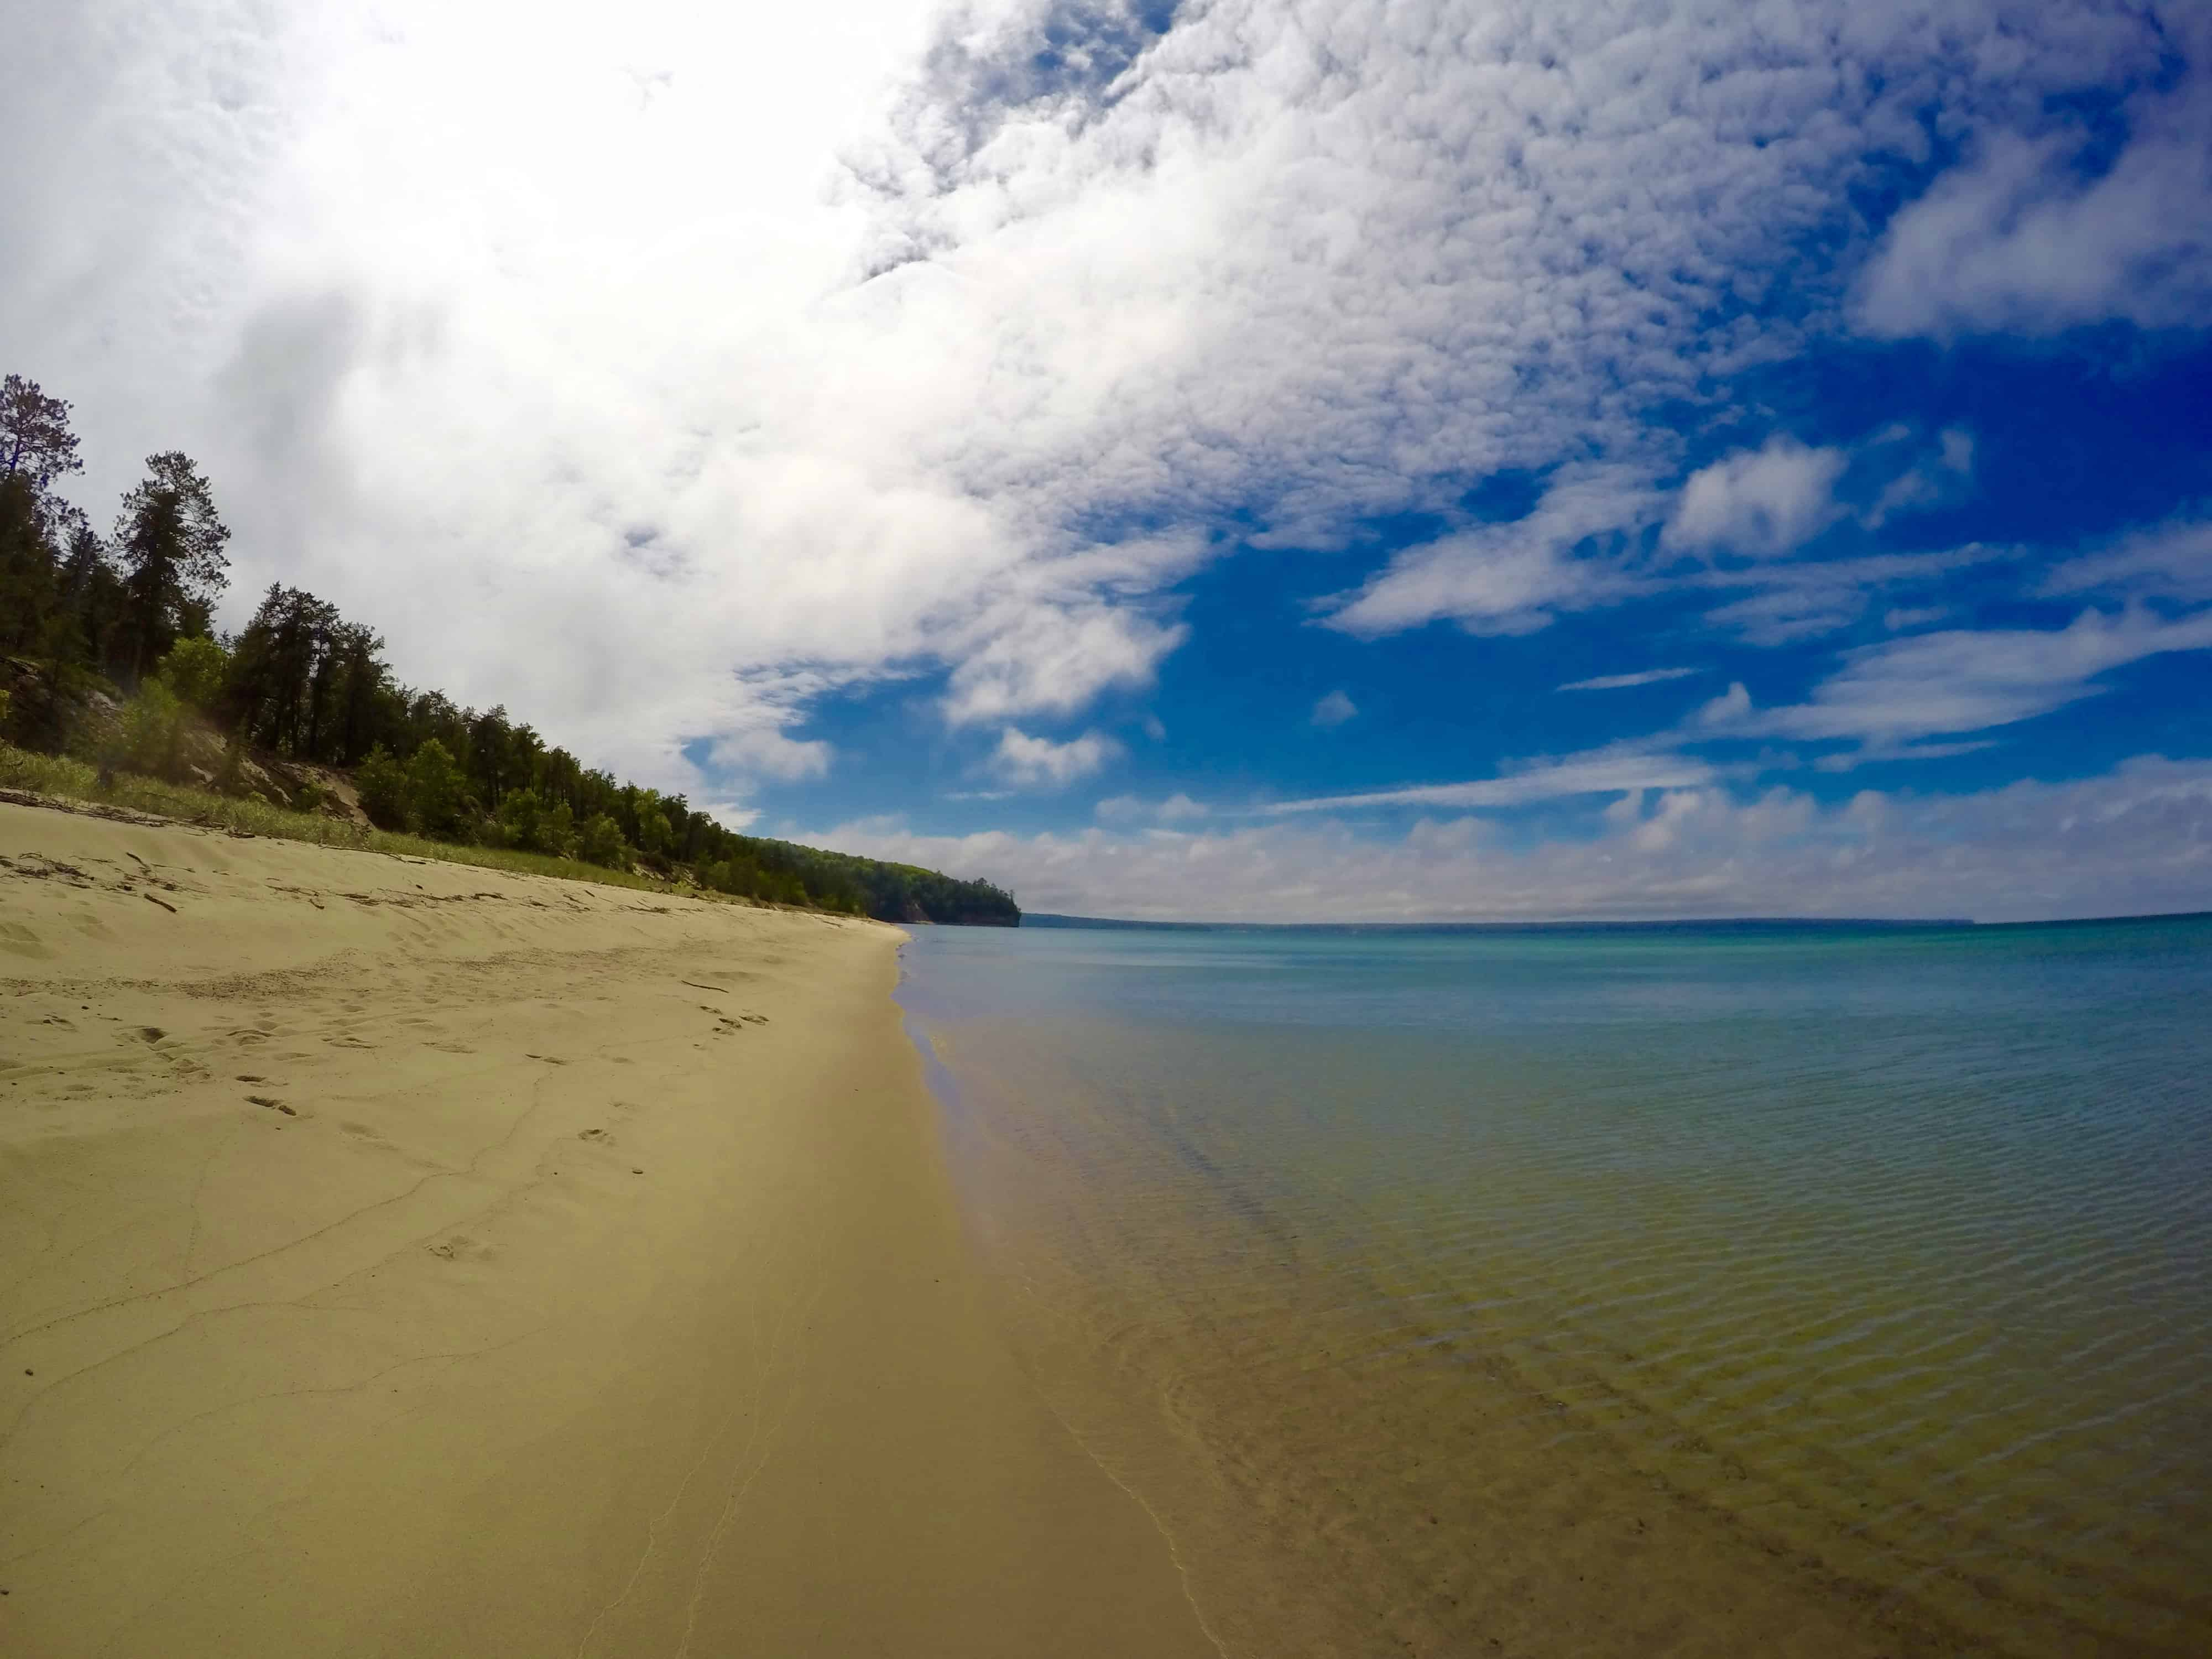 scenic beautiful Michigan view at Pictured Rocks National Lakeshore